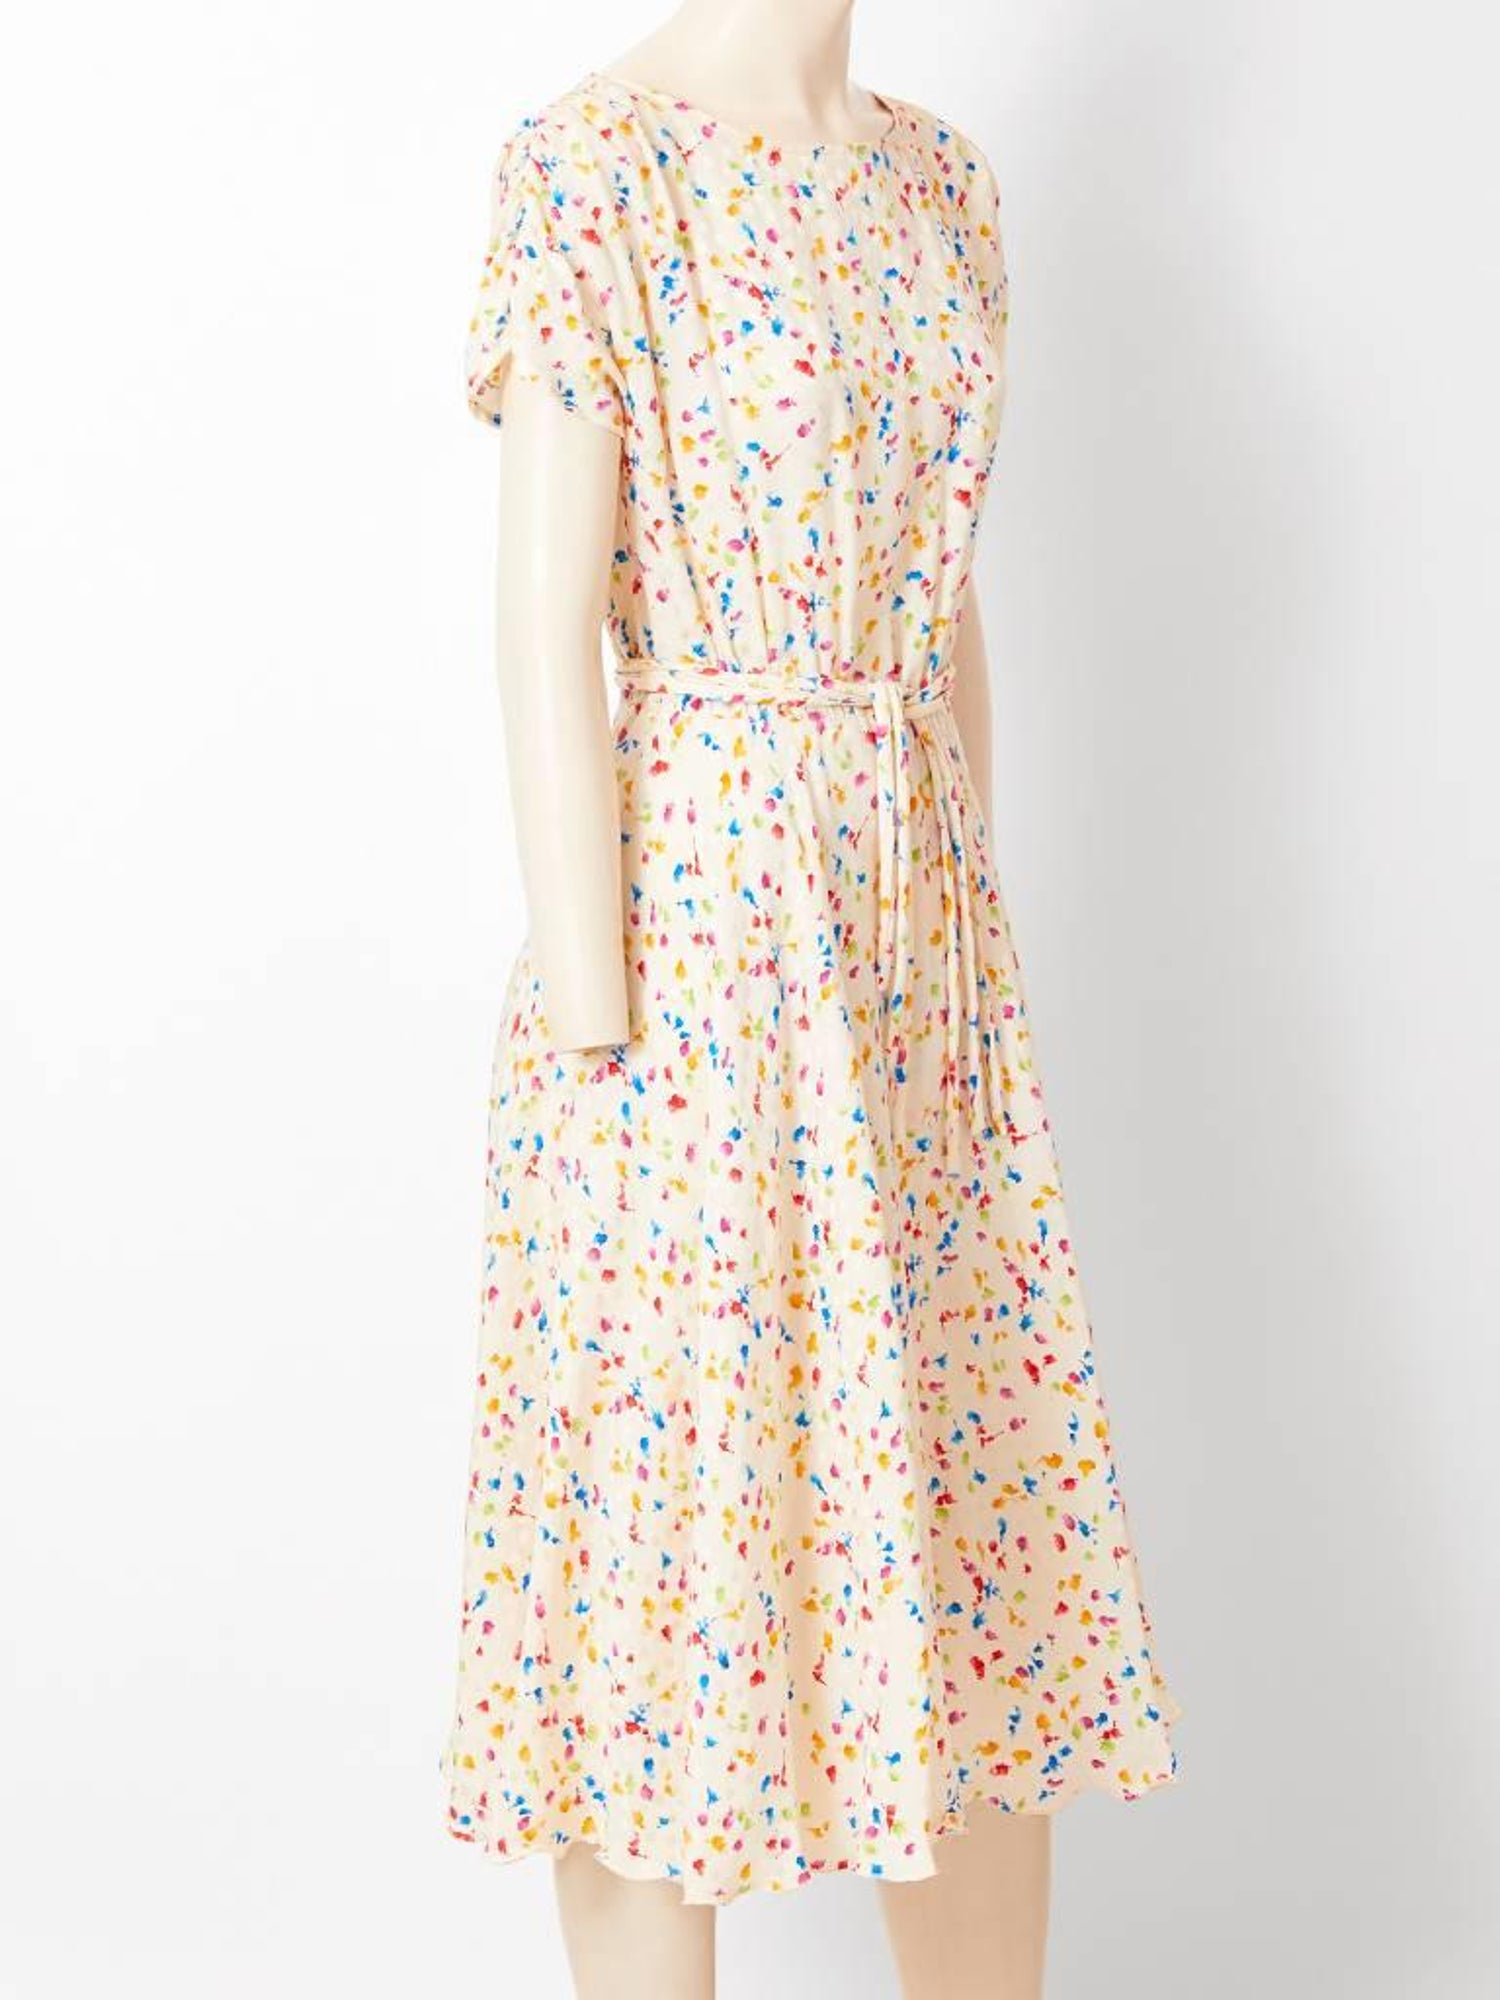 ab27b1eb8 Gucci Printed Silk Day Dress at 1stdibs